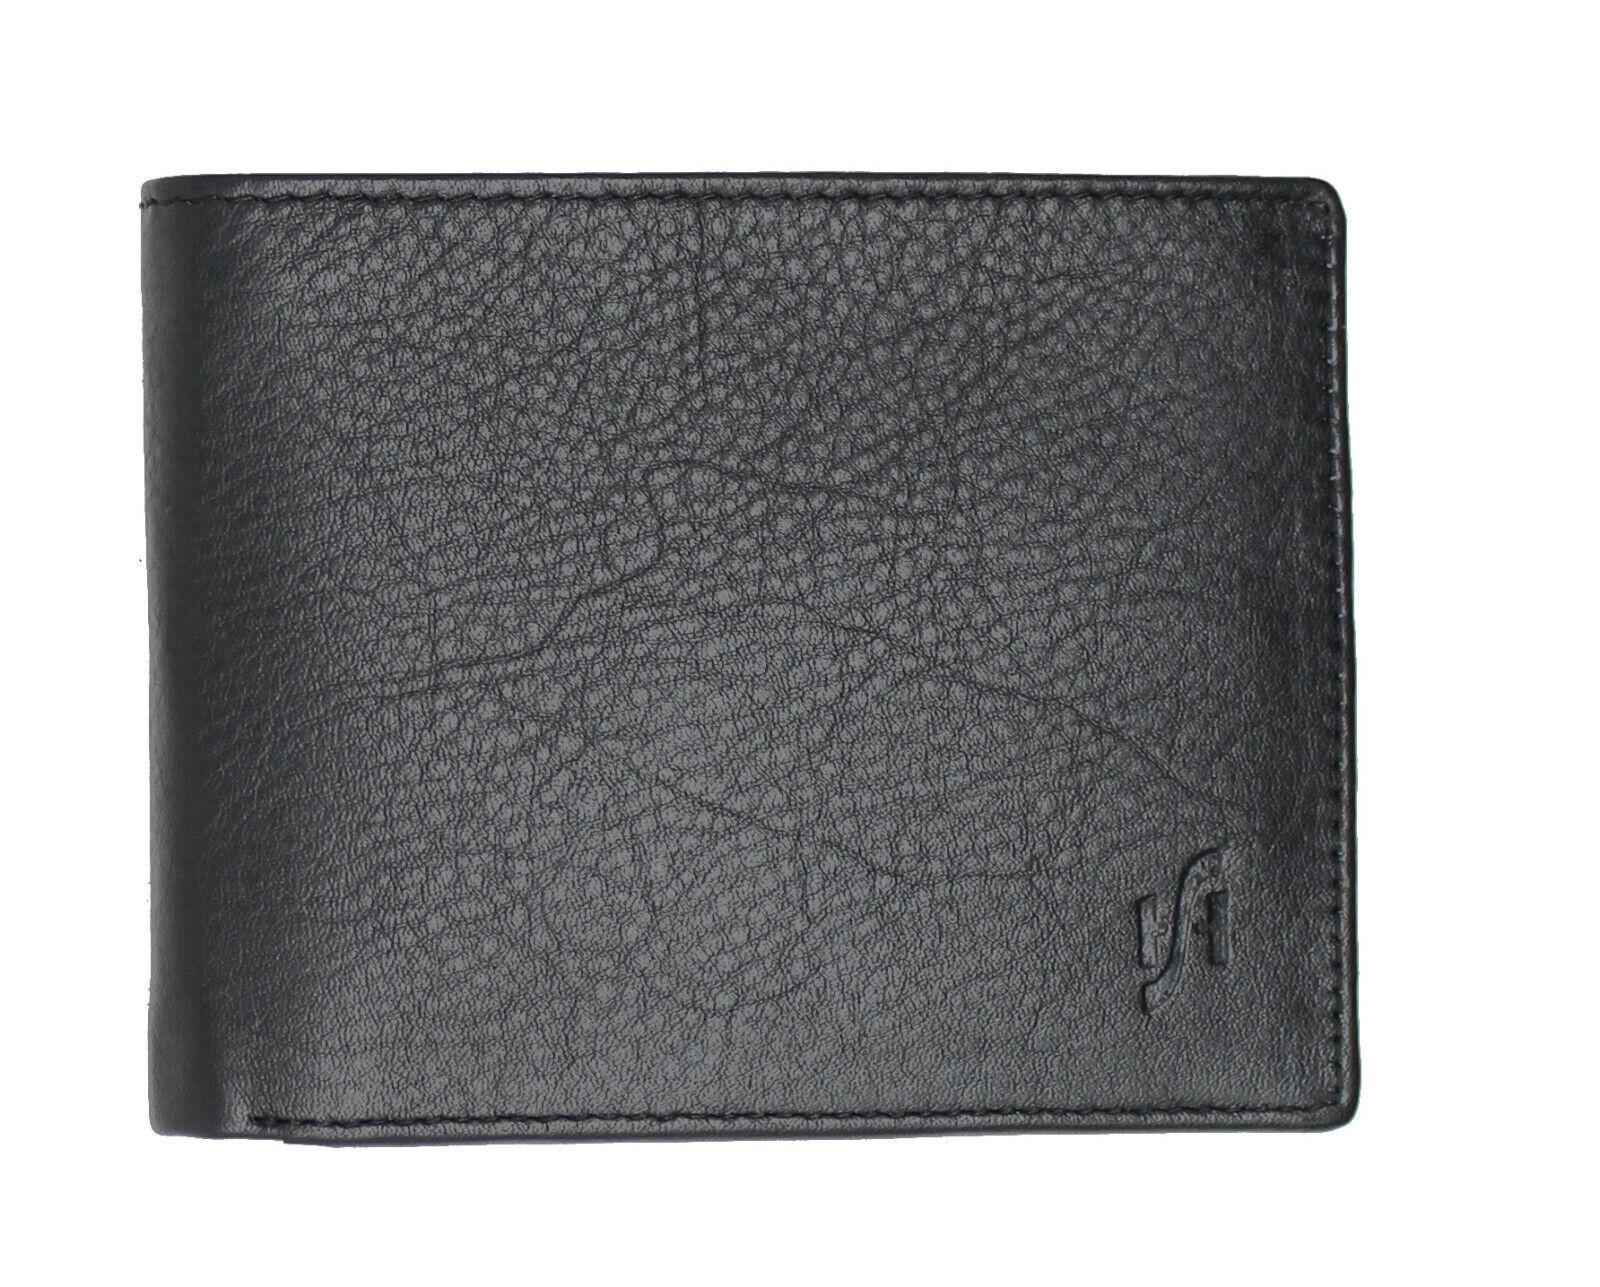 Mens RFID Blocking Soft Nappa Leather Wallet Black Grey